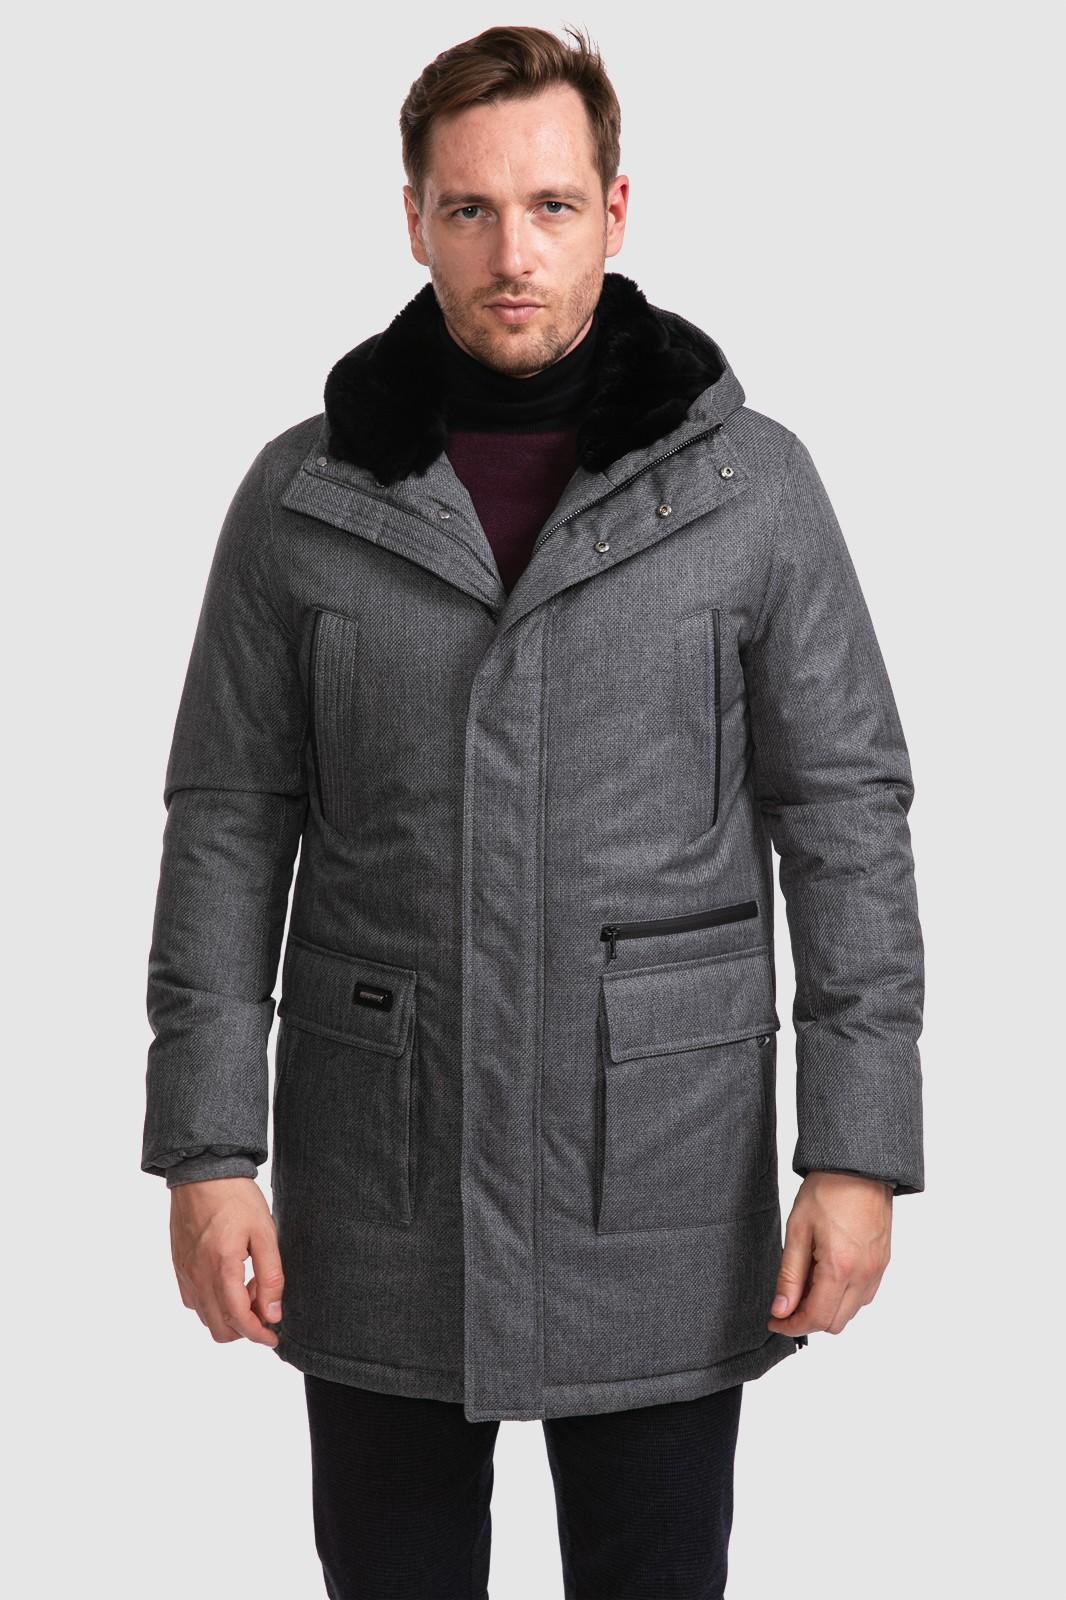 Kanzler Куртка с натуральным мехом на капюшоне KANZLER